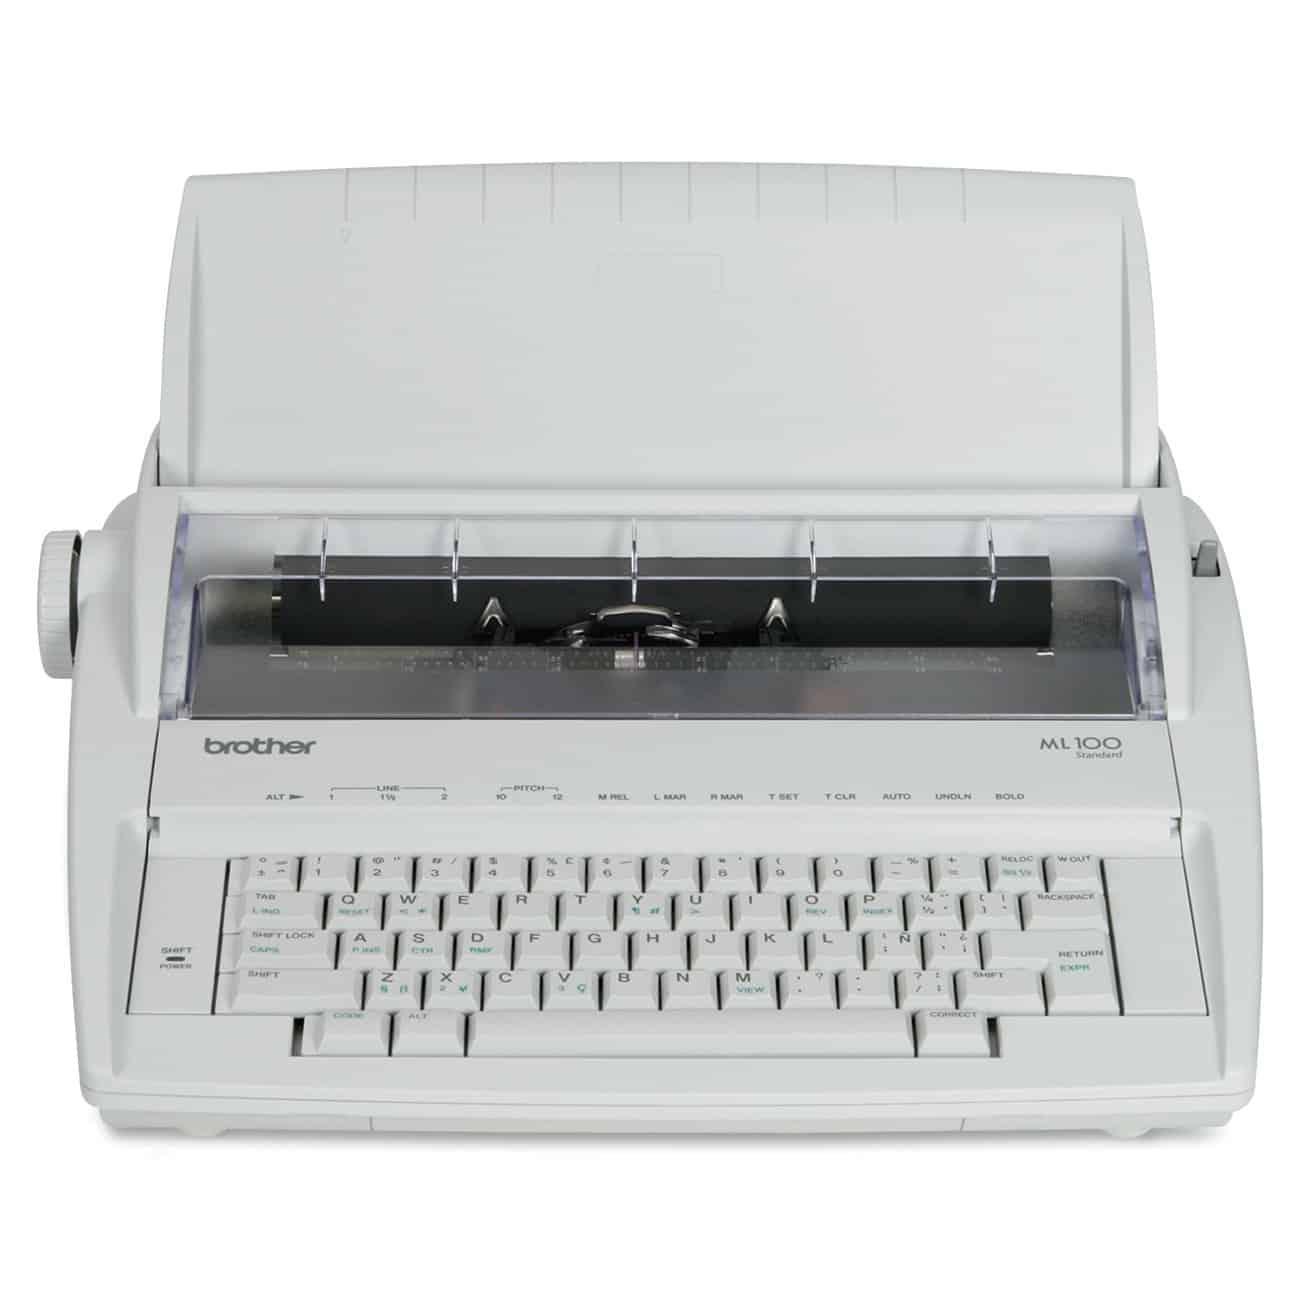 Brother ML-100 Daisy Wheel Electronic Typewriter